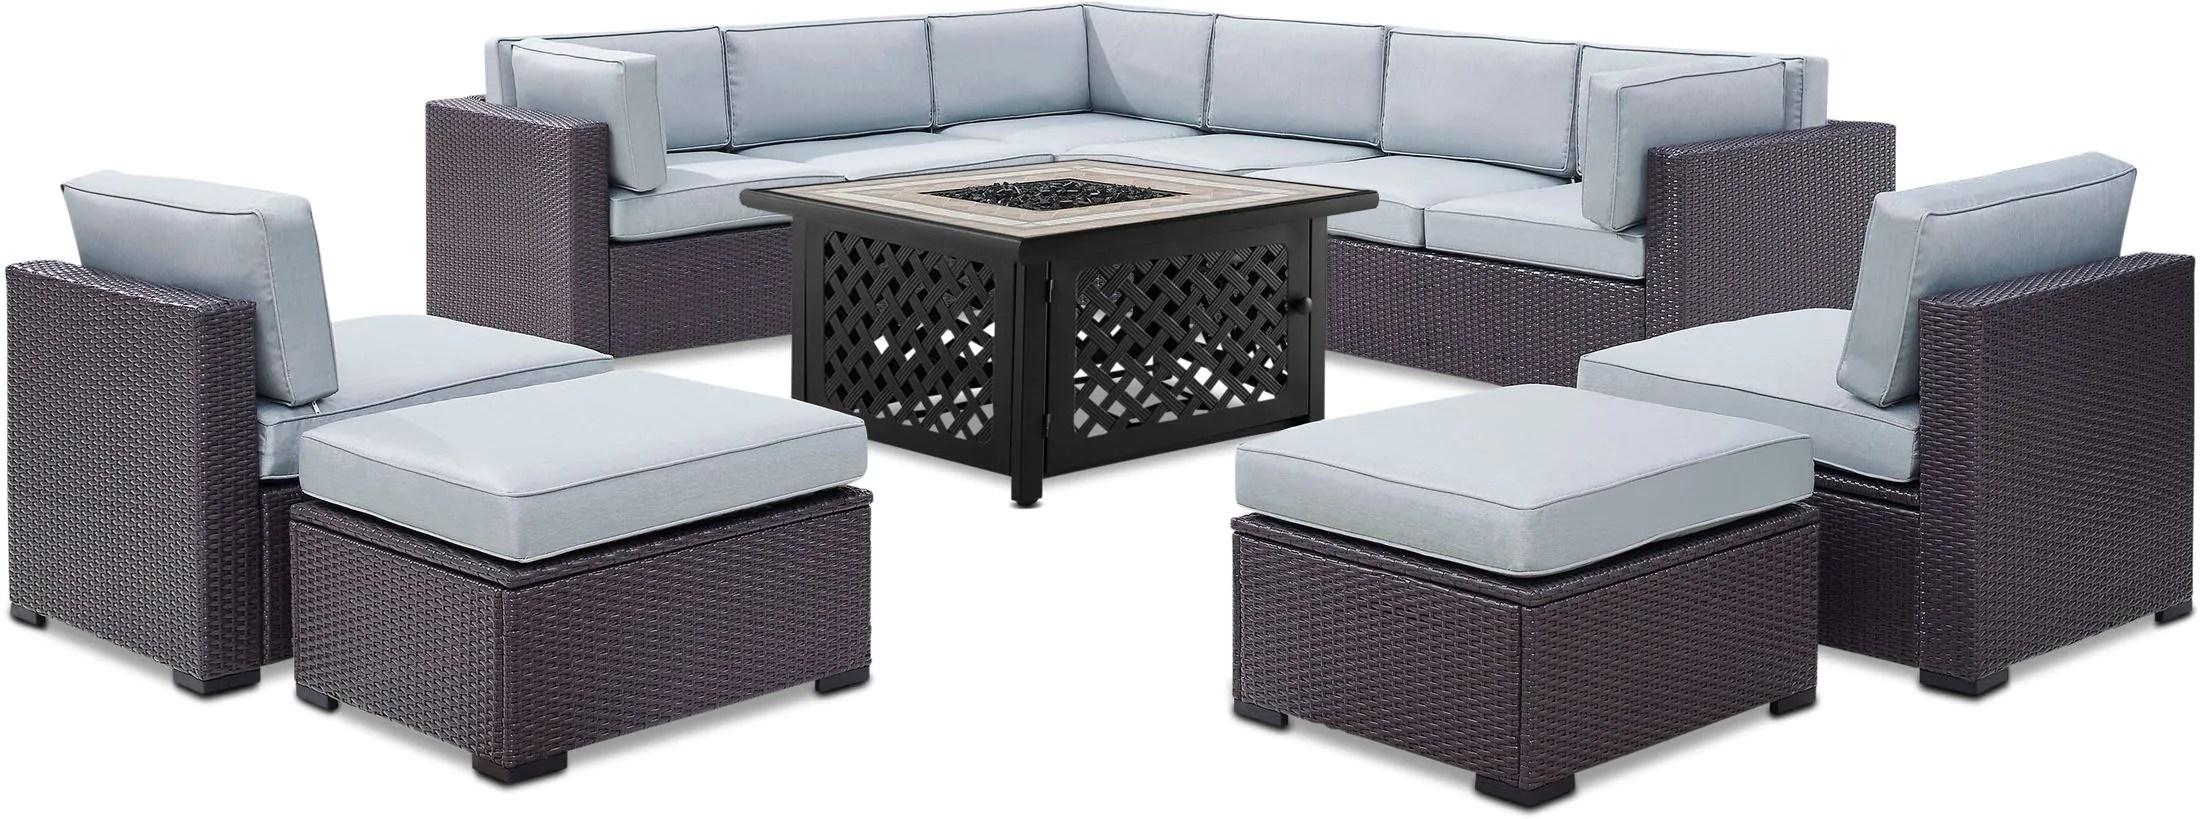 shop all patio furniture value city